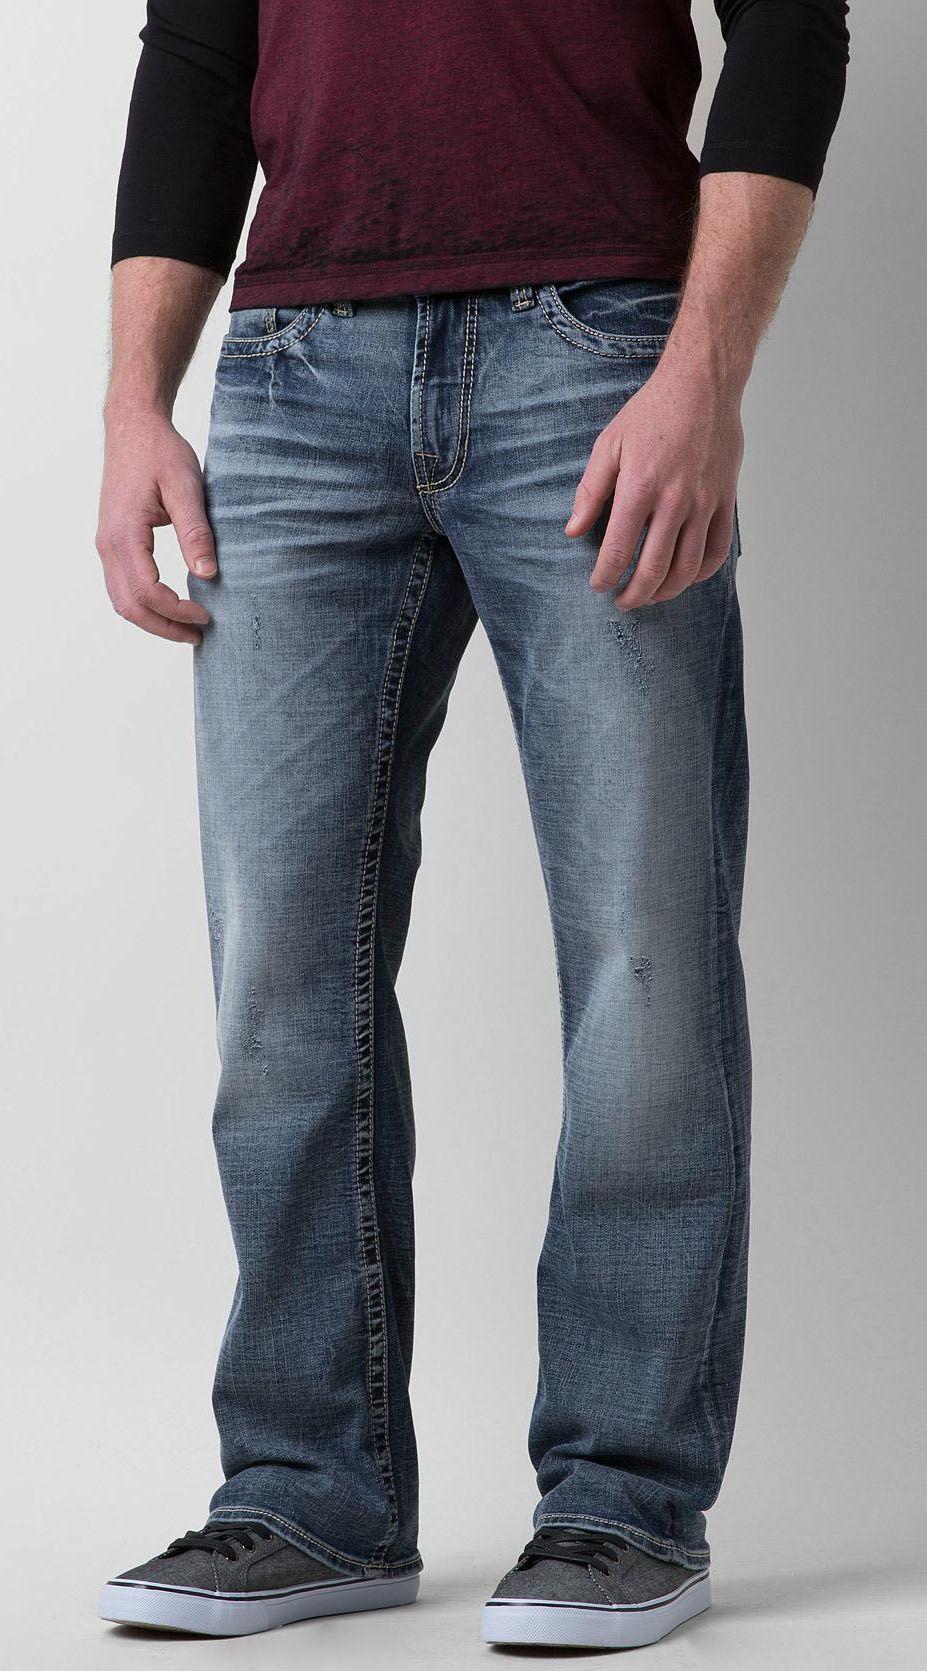 Salvage Mayhem Boot Jean - Men' Jeans Buckle Edgy Men